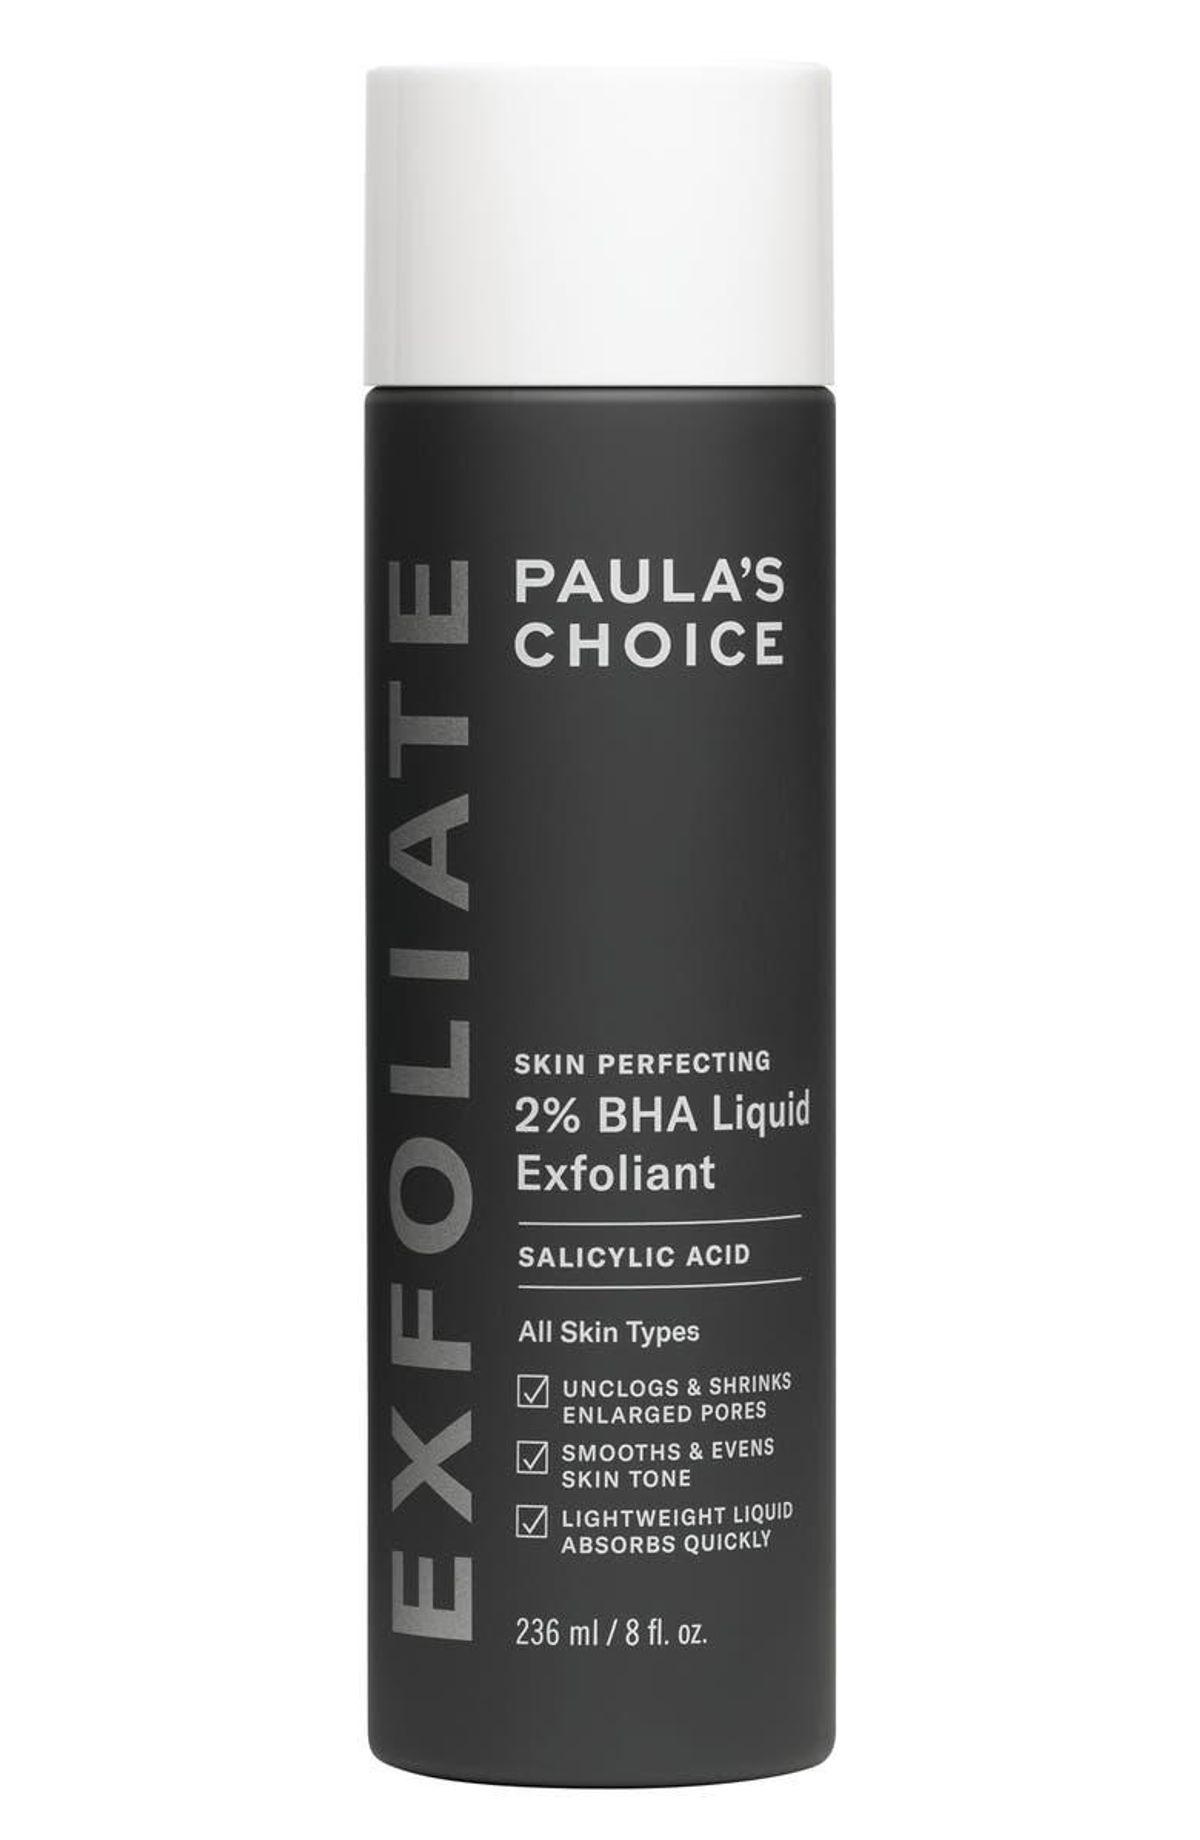 paulas choice jumbo skin perfecting exfoliant